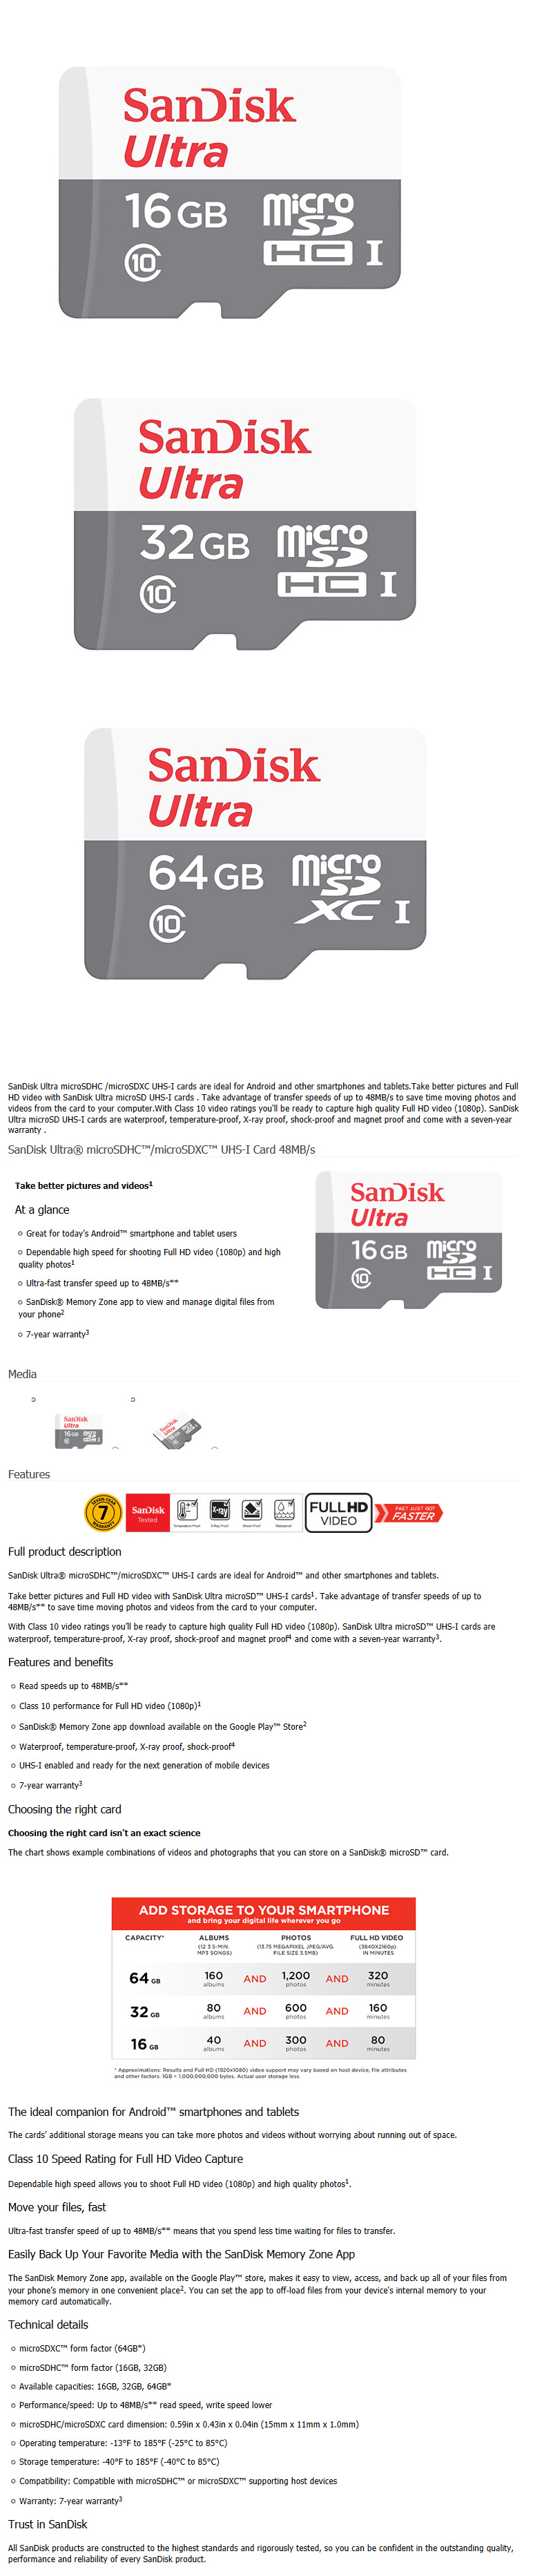 Buy Original Sandisk Ultra Microsd Micro Sd Sdhc Shdxc Class 10 16gb Card 48mbps Highlights